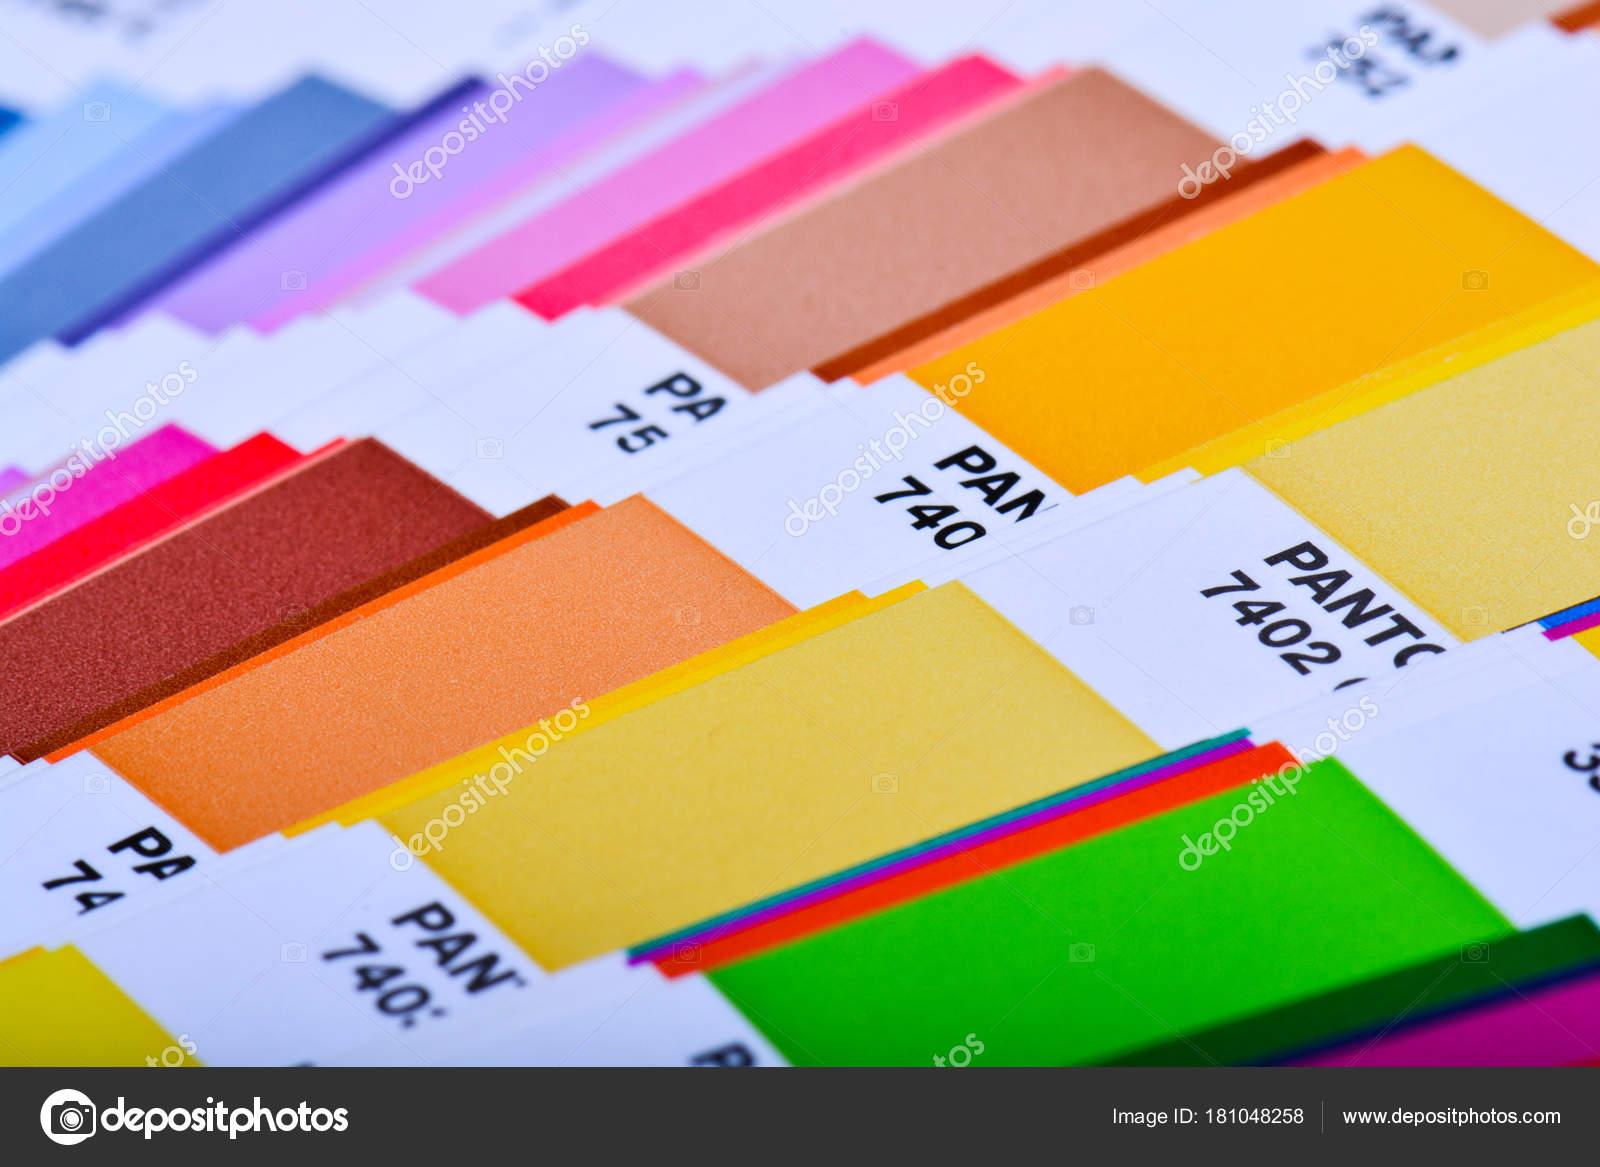 Guía Paleta Colores Cerca Catálogo Swatch Colores — Foto de stock ...